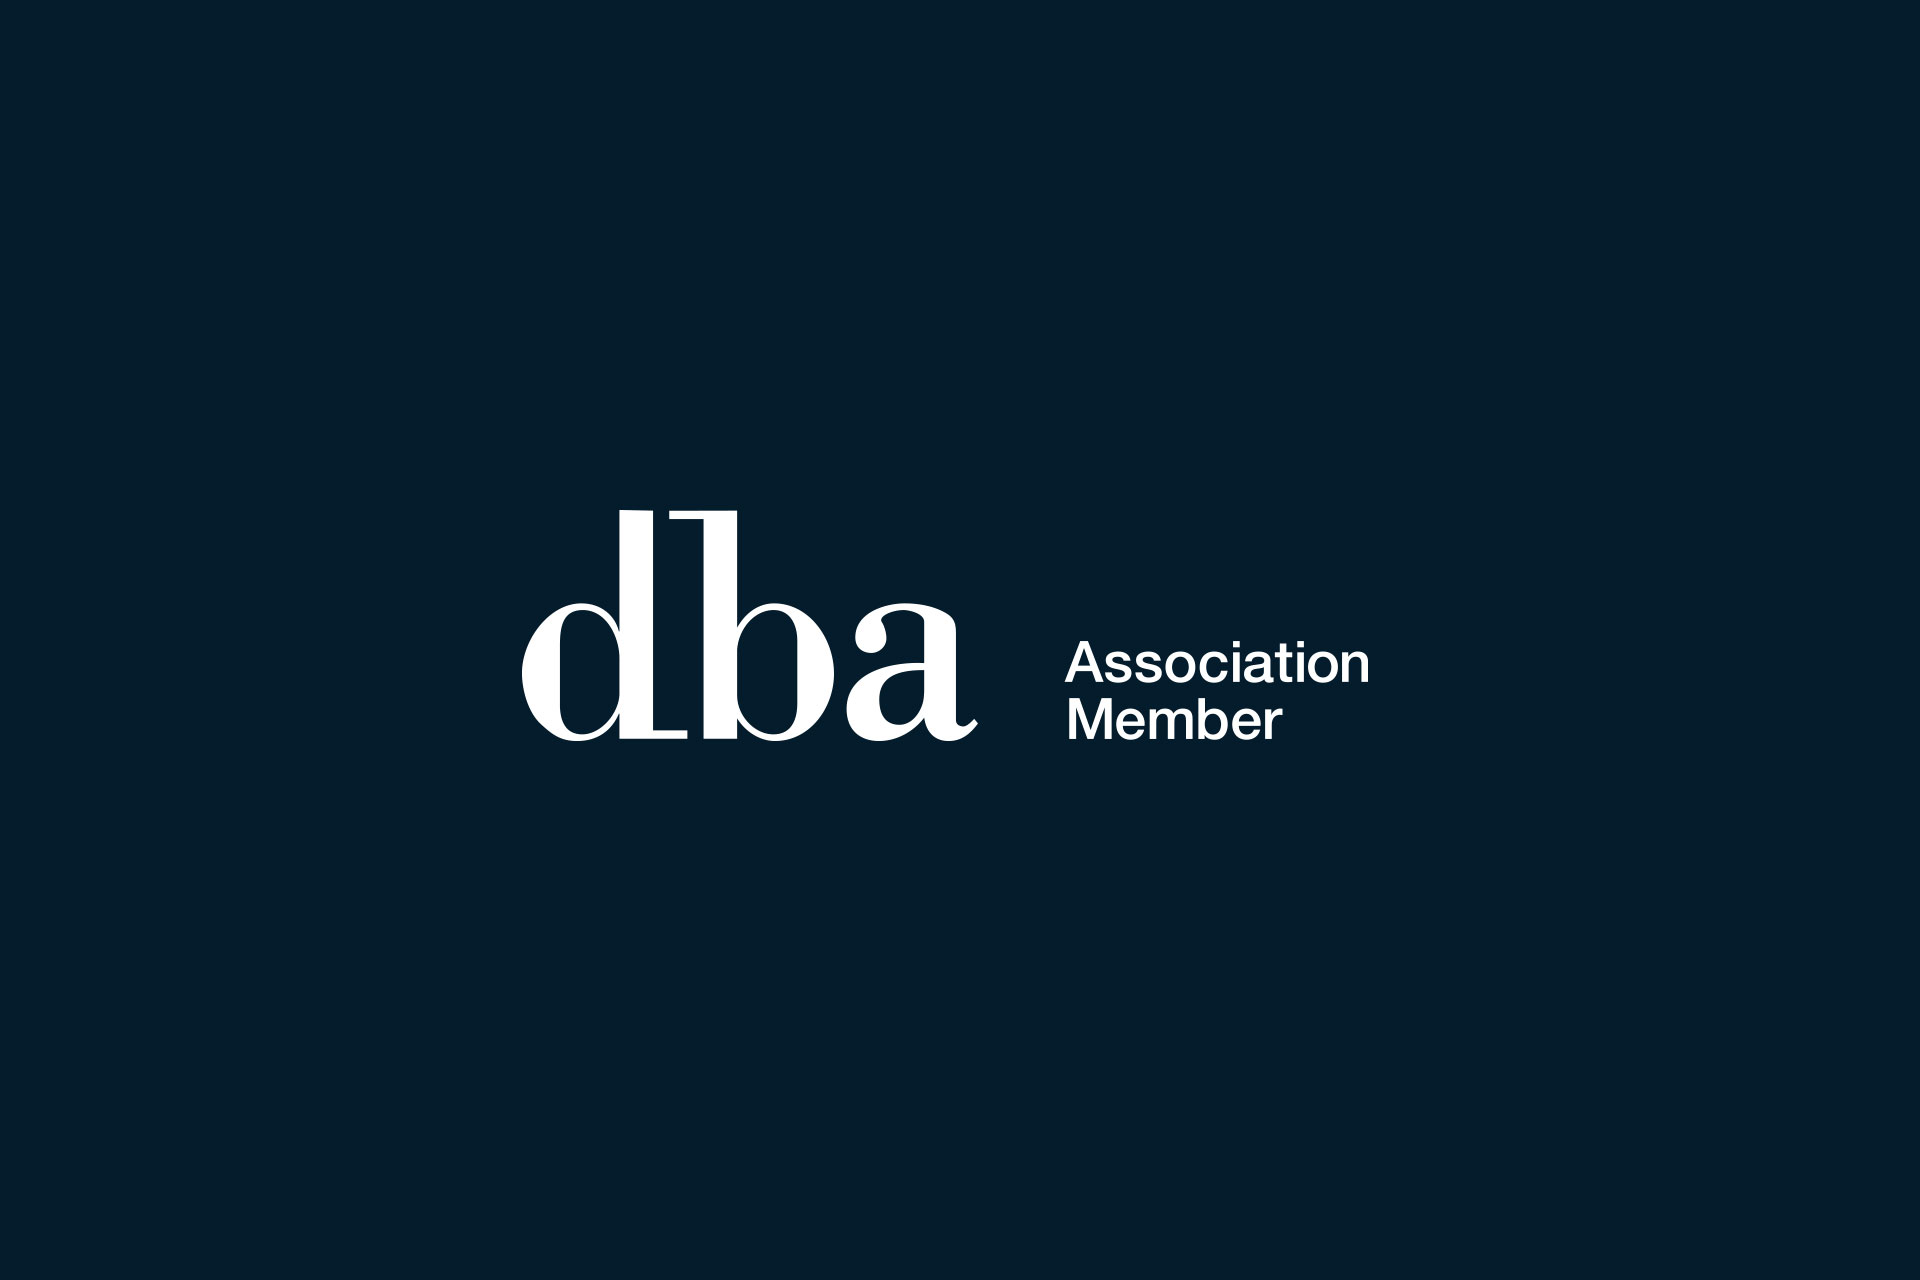 Design Business Association (DBA)